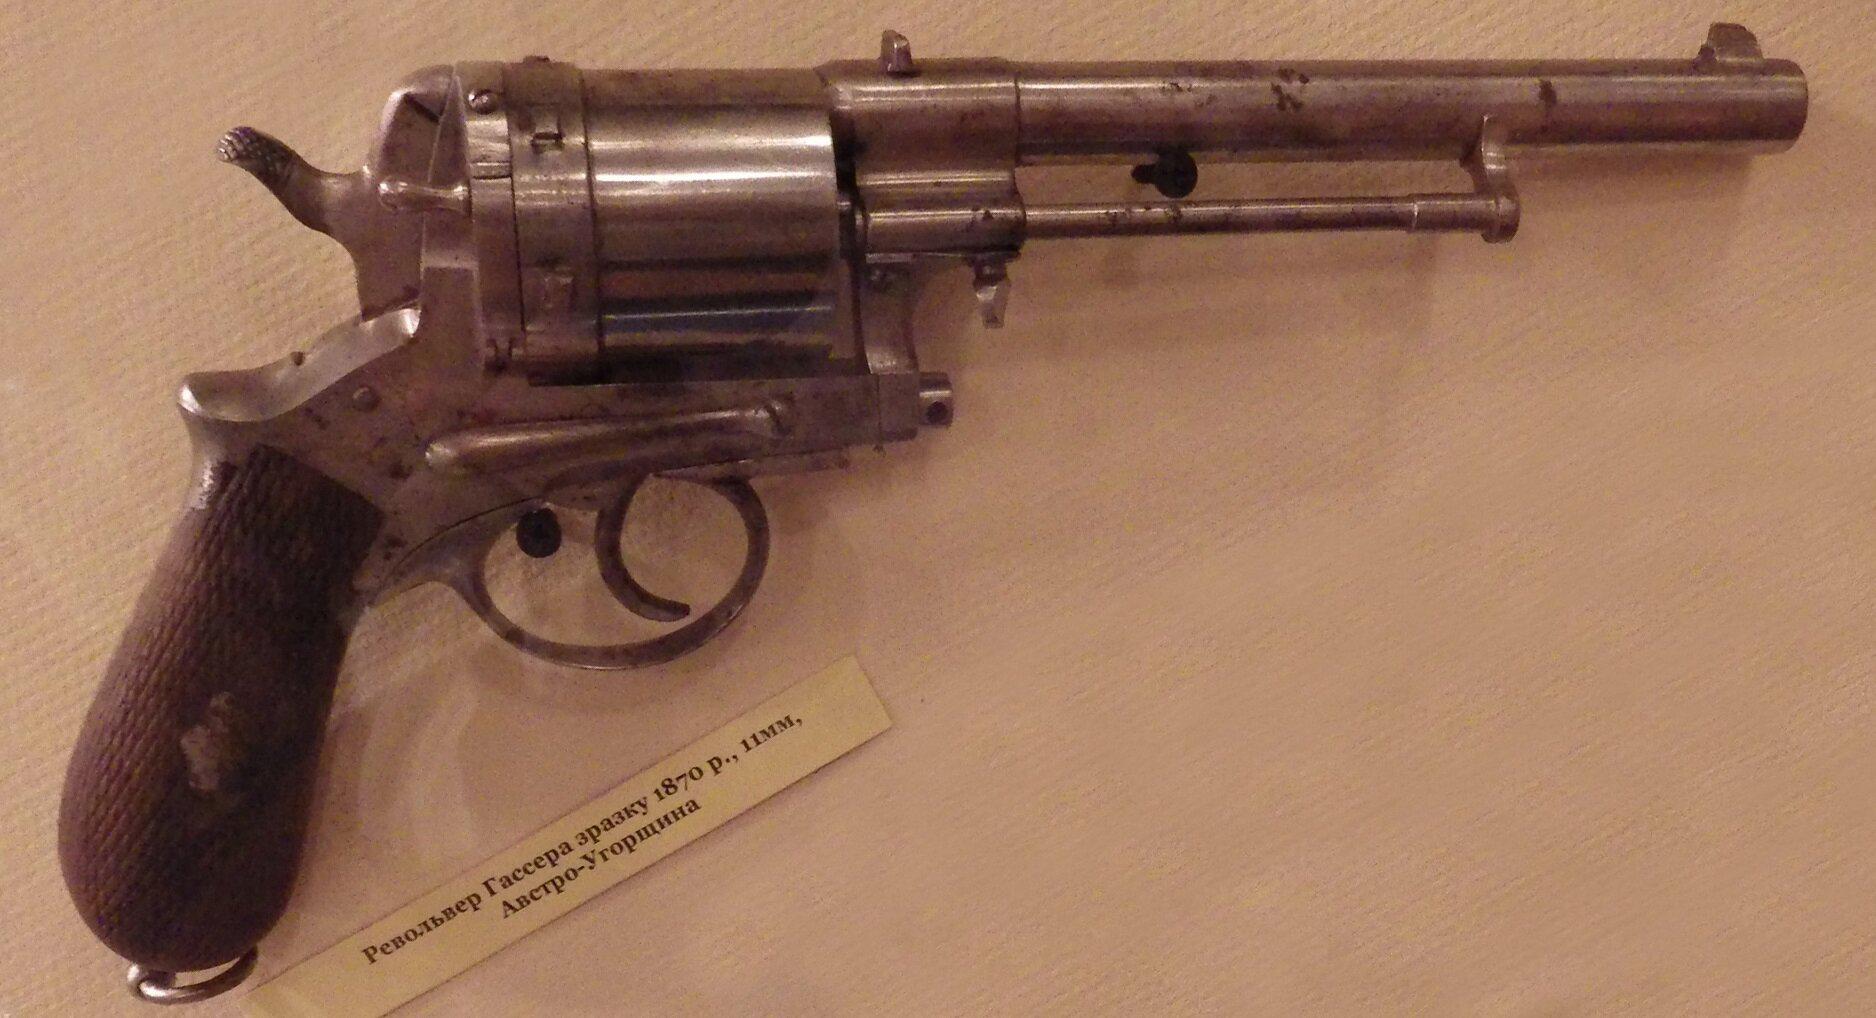 Gasser Revolver a Gasser Revolver Displayed at